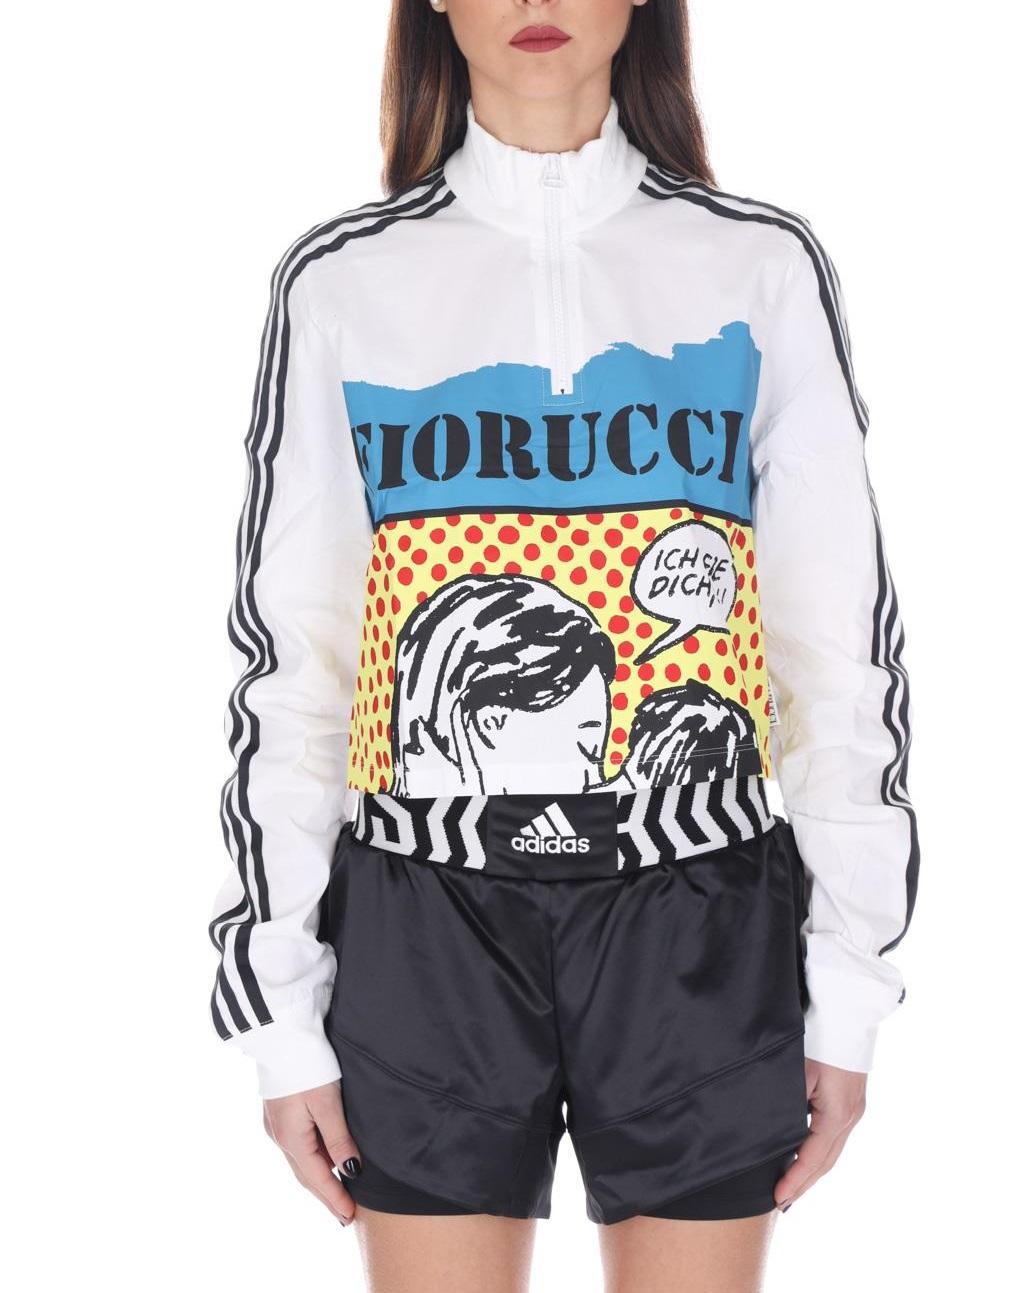 T-shirt Graphic Adidas FL4154 WHITE -19